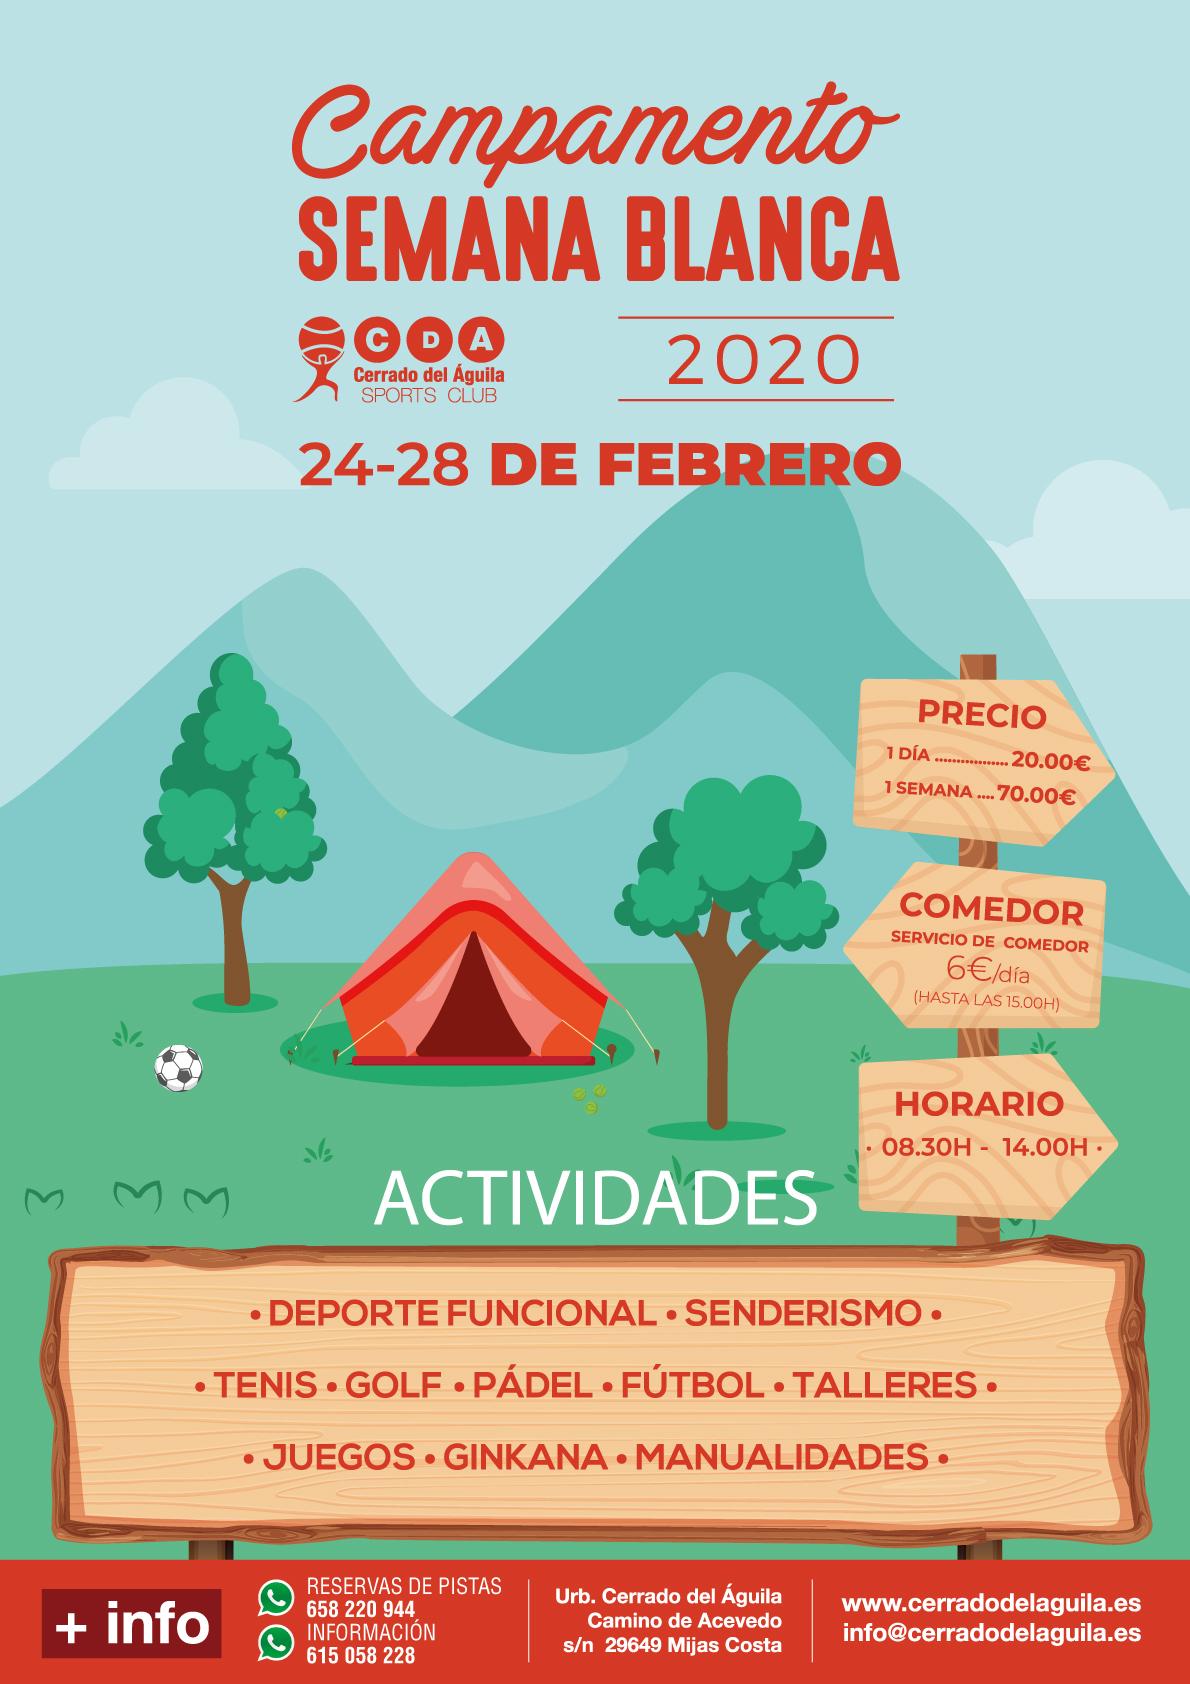 Campamento_Semana_Blanca_2020